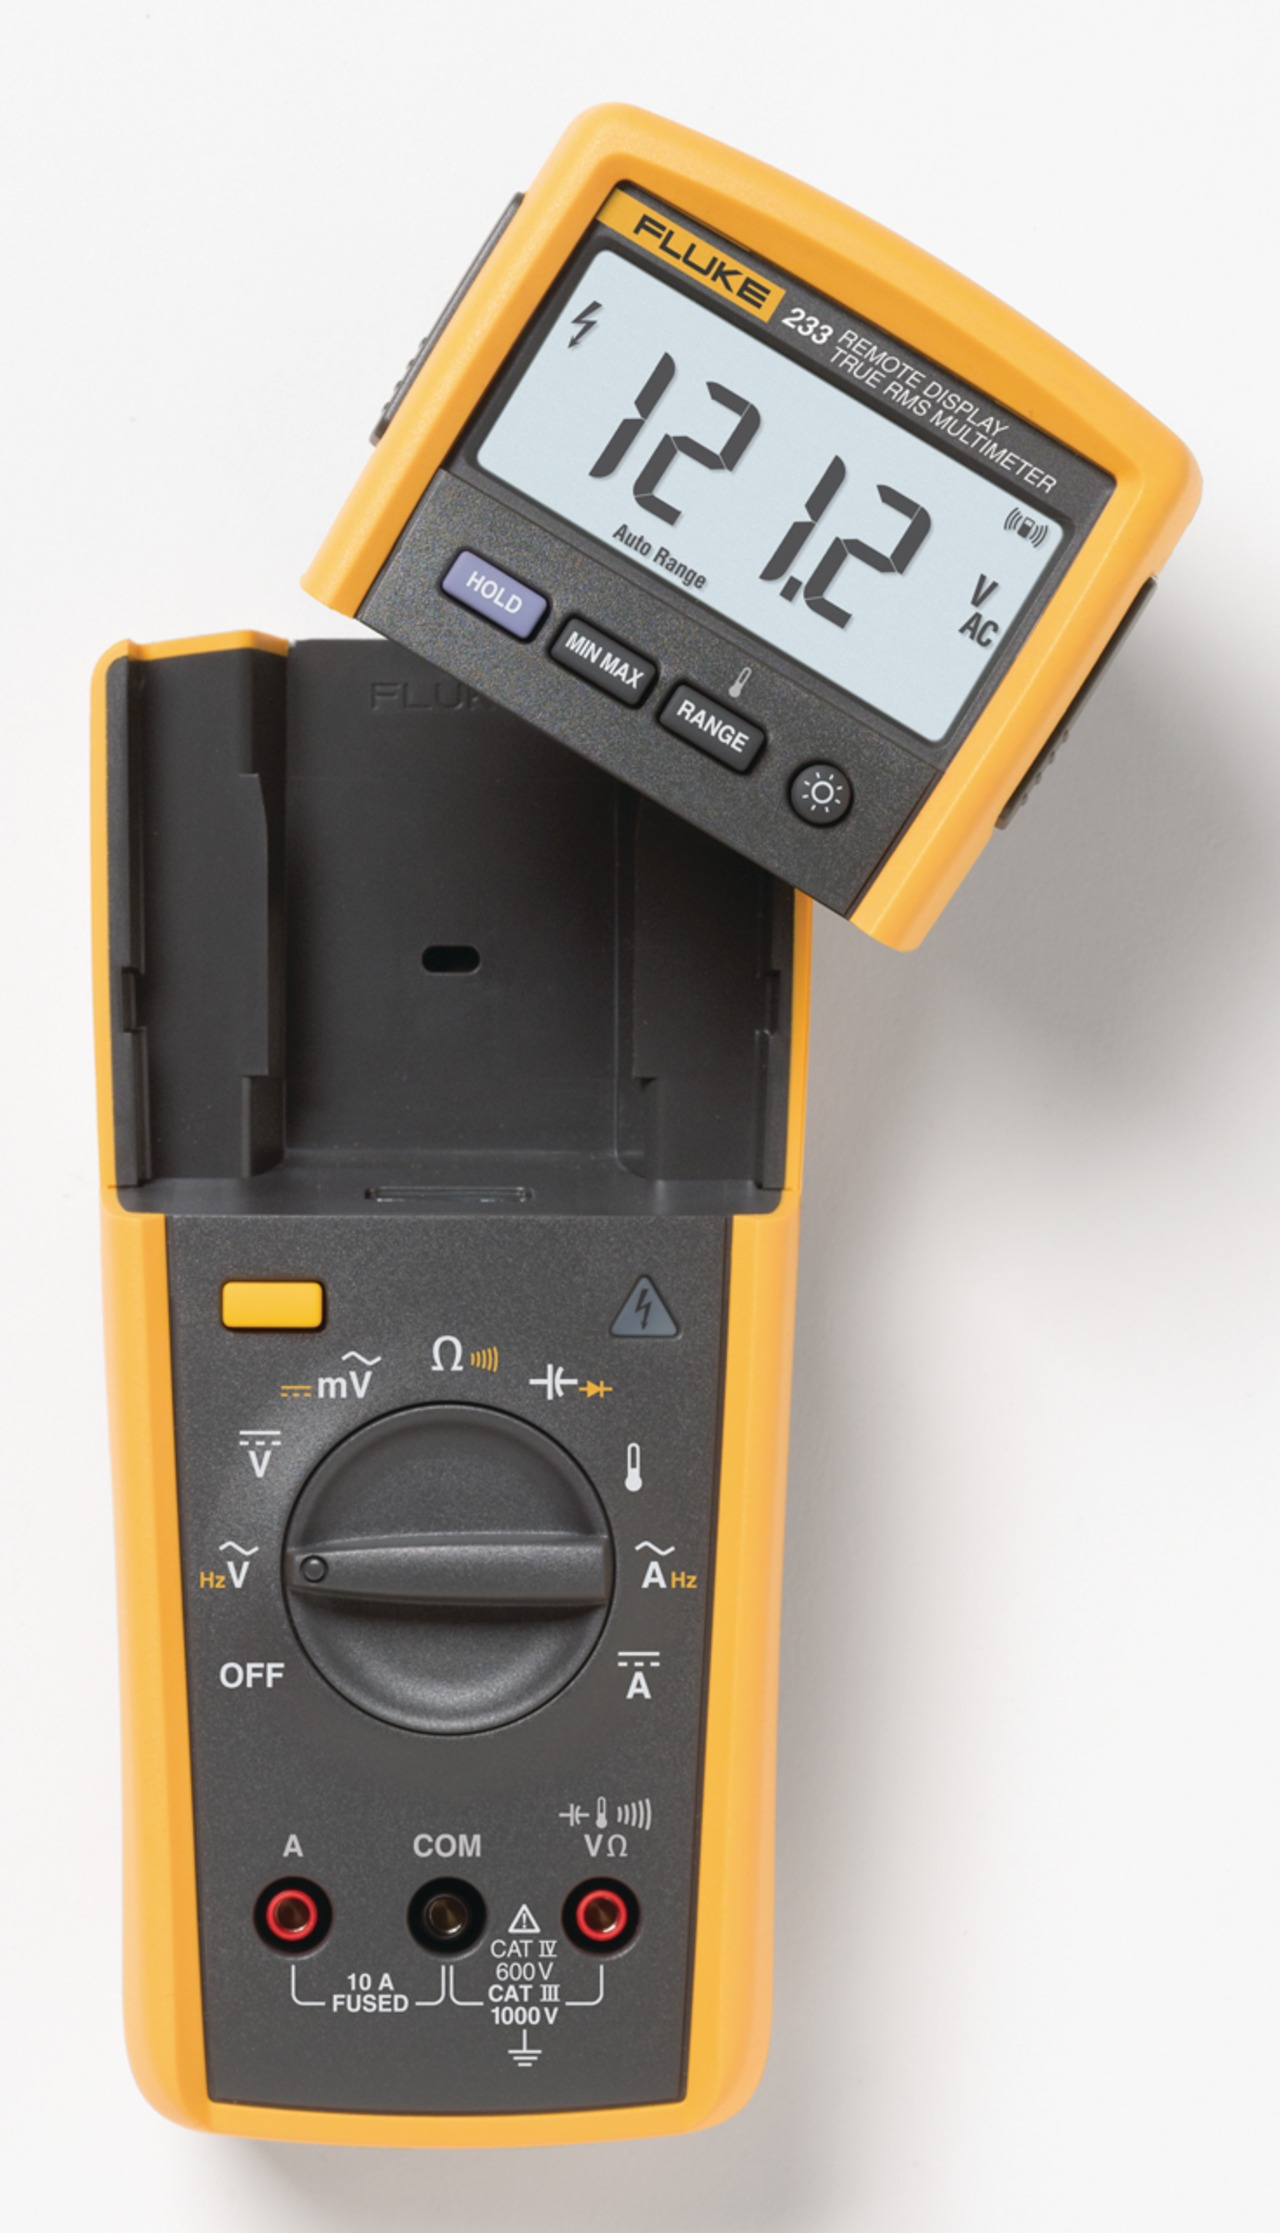 Tool Review: Fluke Manufacturing 233/A digital multimeter